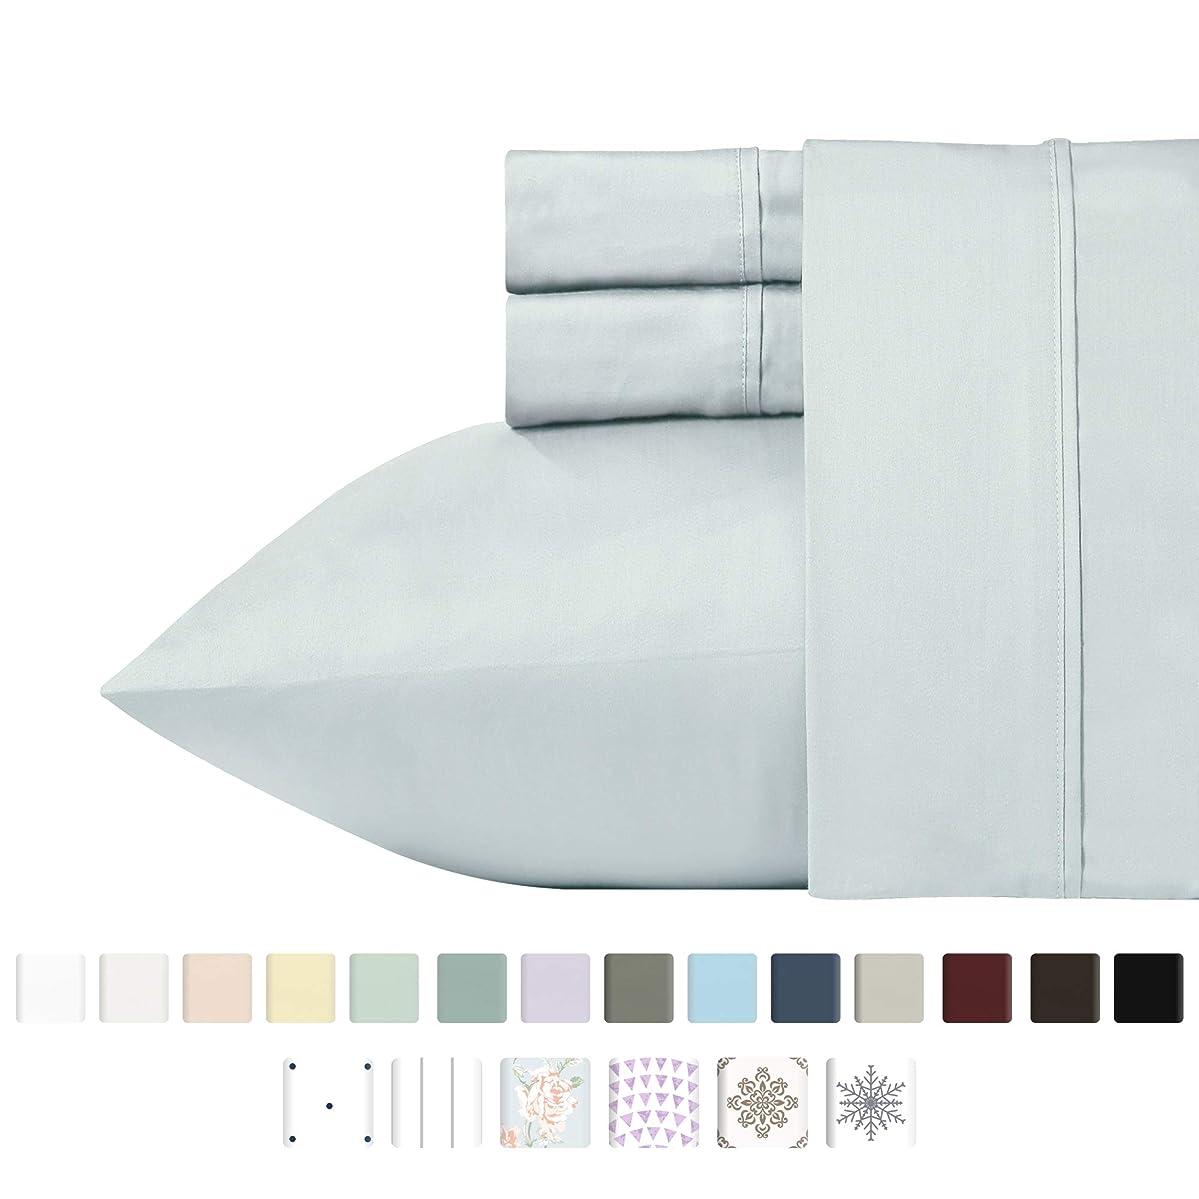 California Design Den 400 Thread Count 100% Cotton Sheets - Light Grey Long-Staple Cotton Full Sheets, Fits Mattress Upto 18'' Deep Pocket, Soft Sateen Weave Cotton Bedsheets and Pillowcases